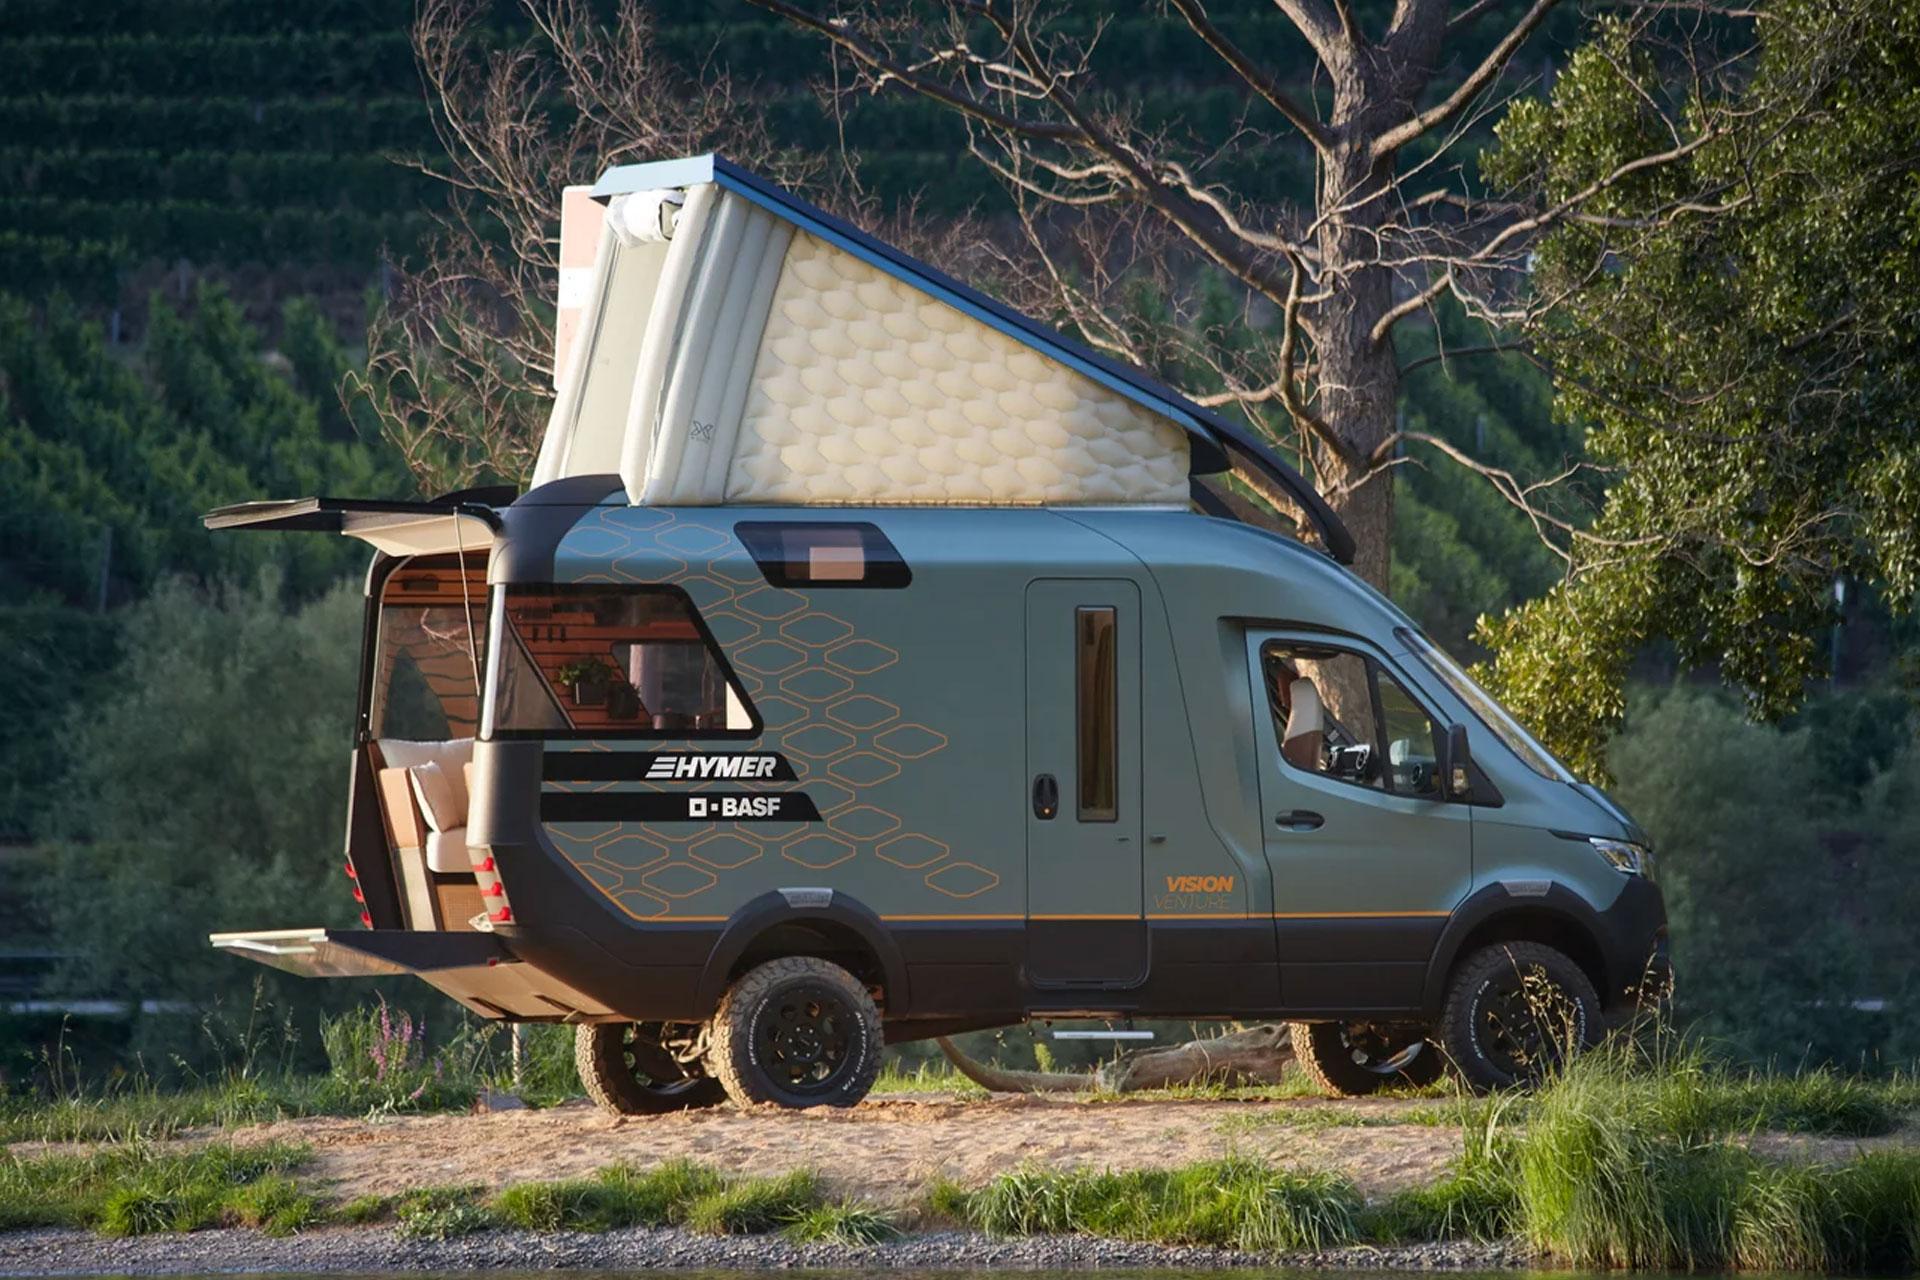 Hymer VisionVenture Camper Van Concept